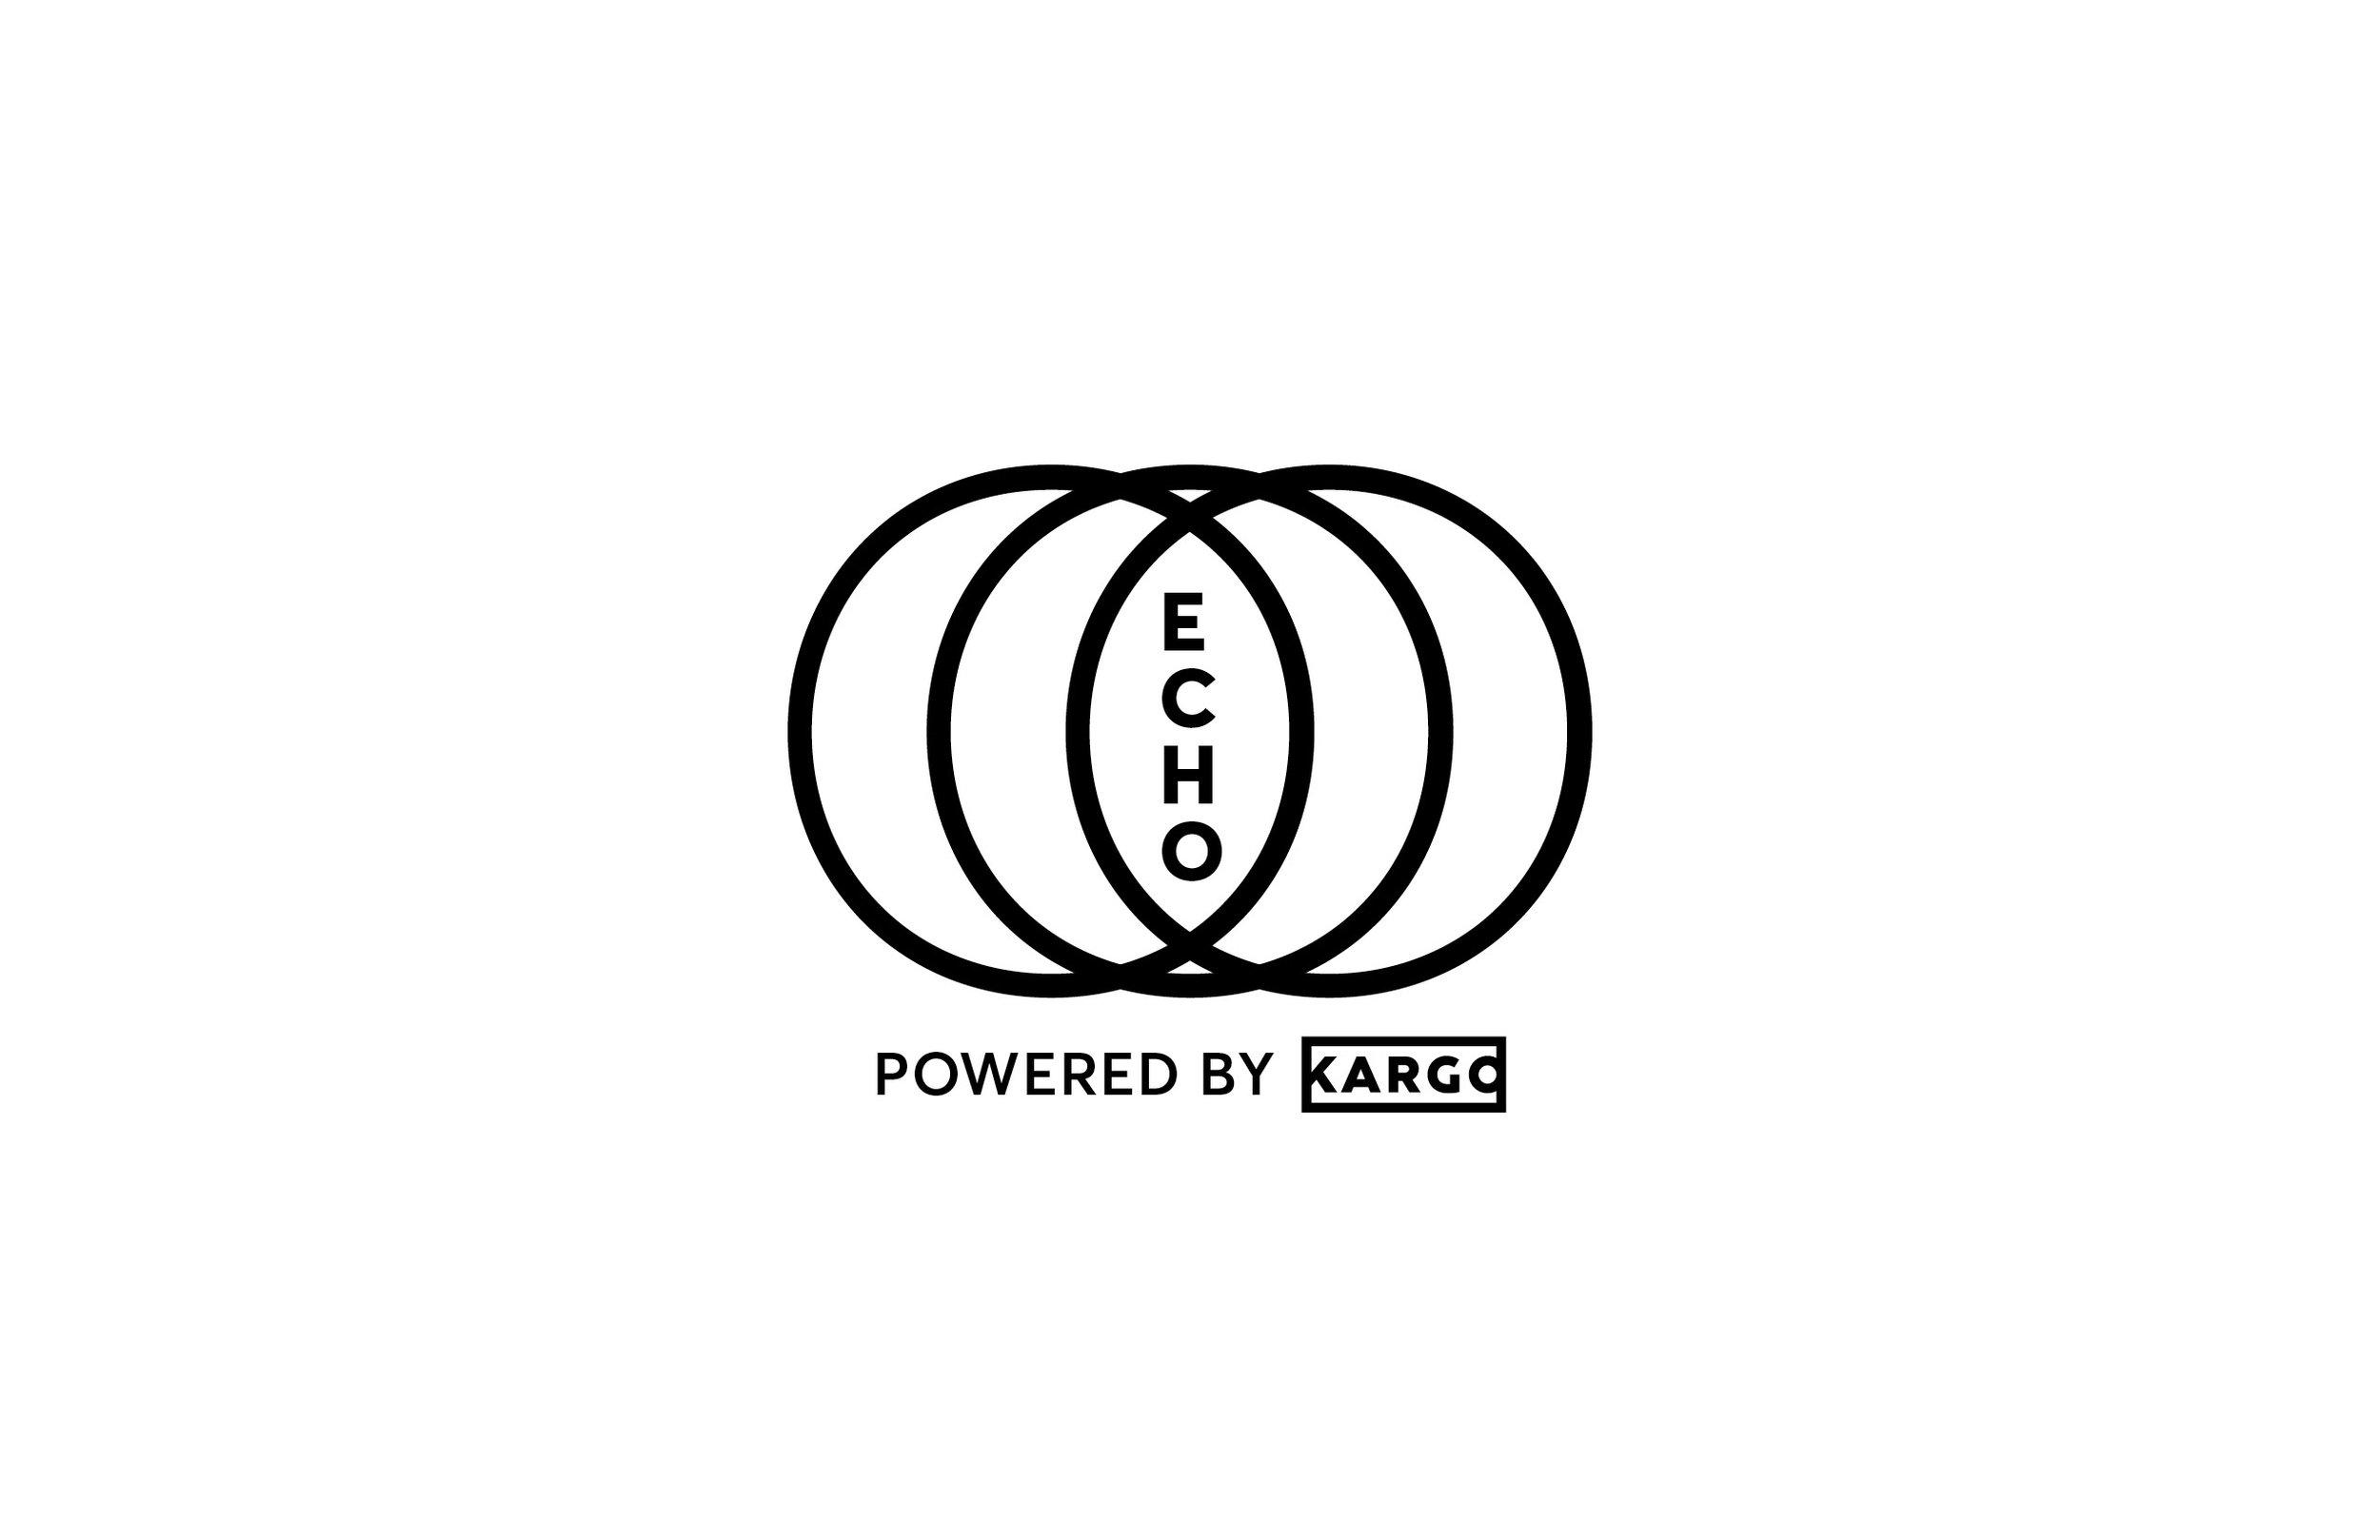 echo logos6.jpg